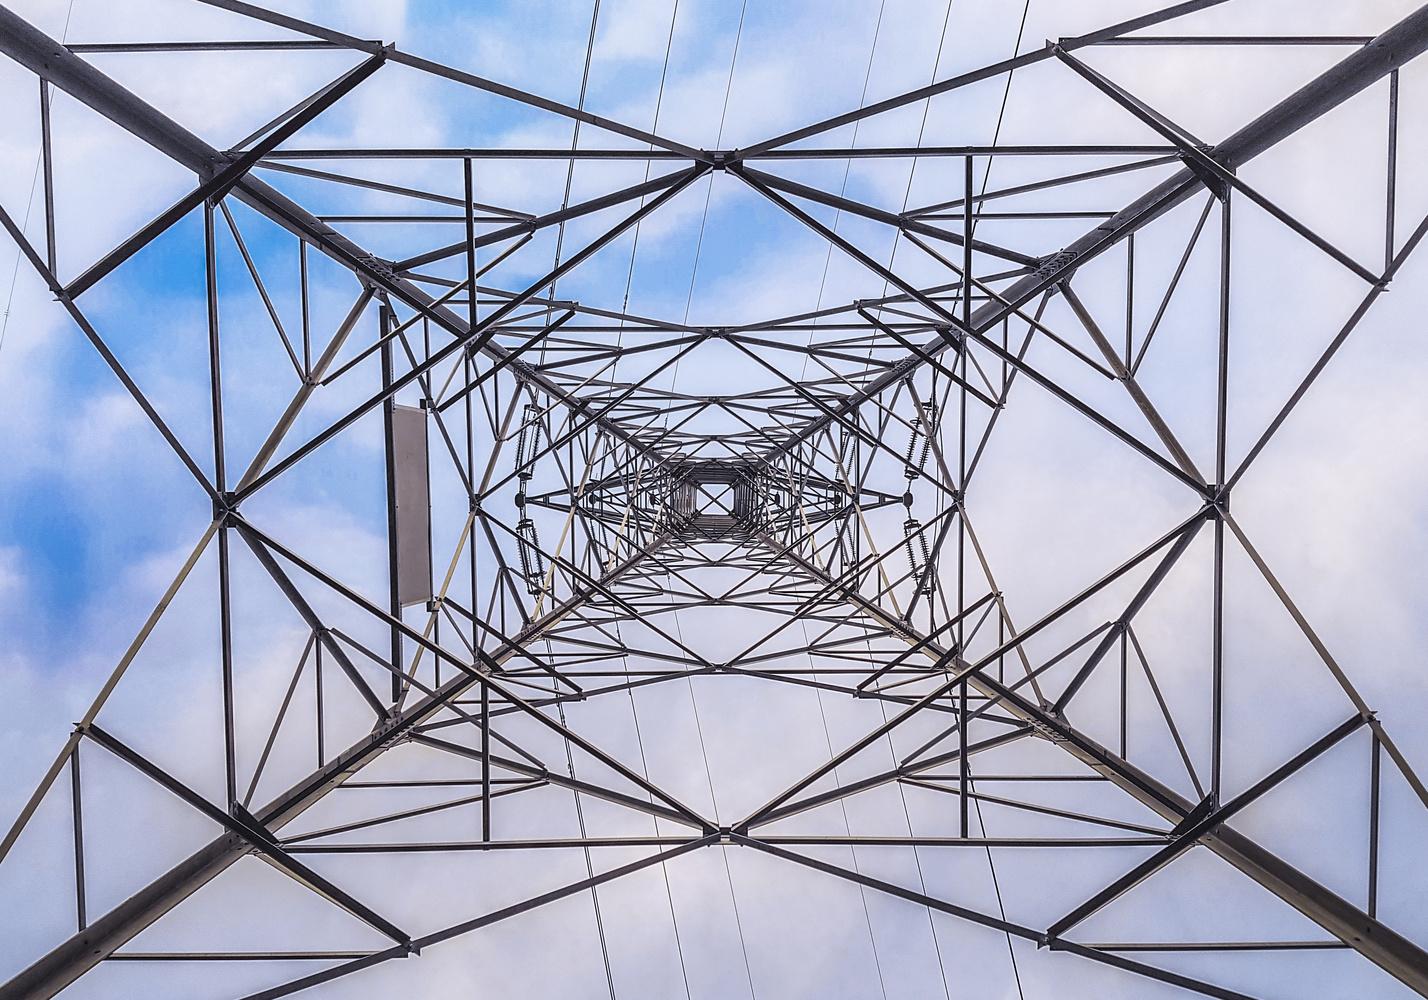 Under The Power by Daniel Boavida